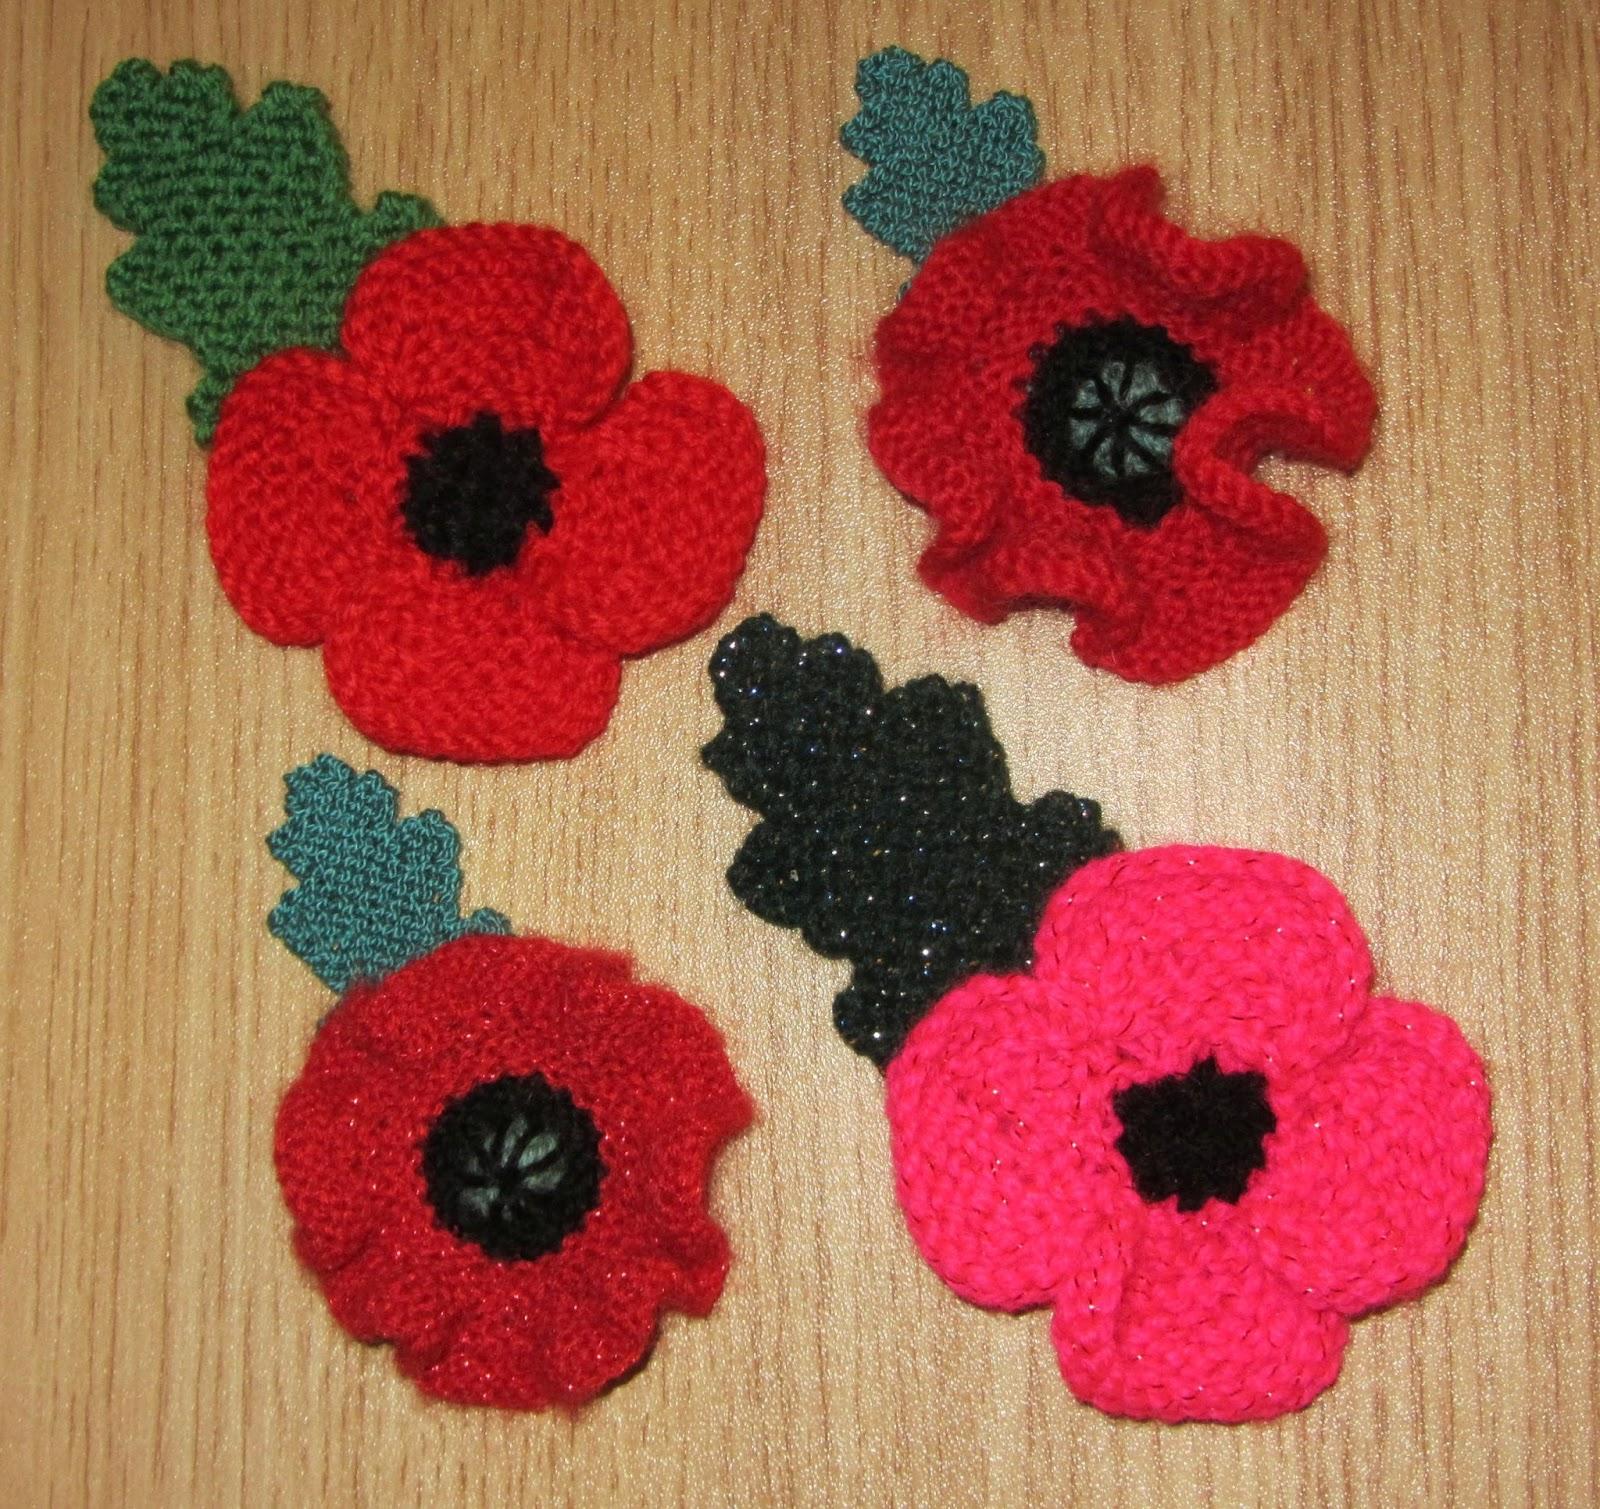 Paulineknit ~ A life of hand knitting